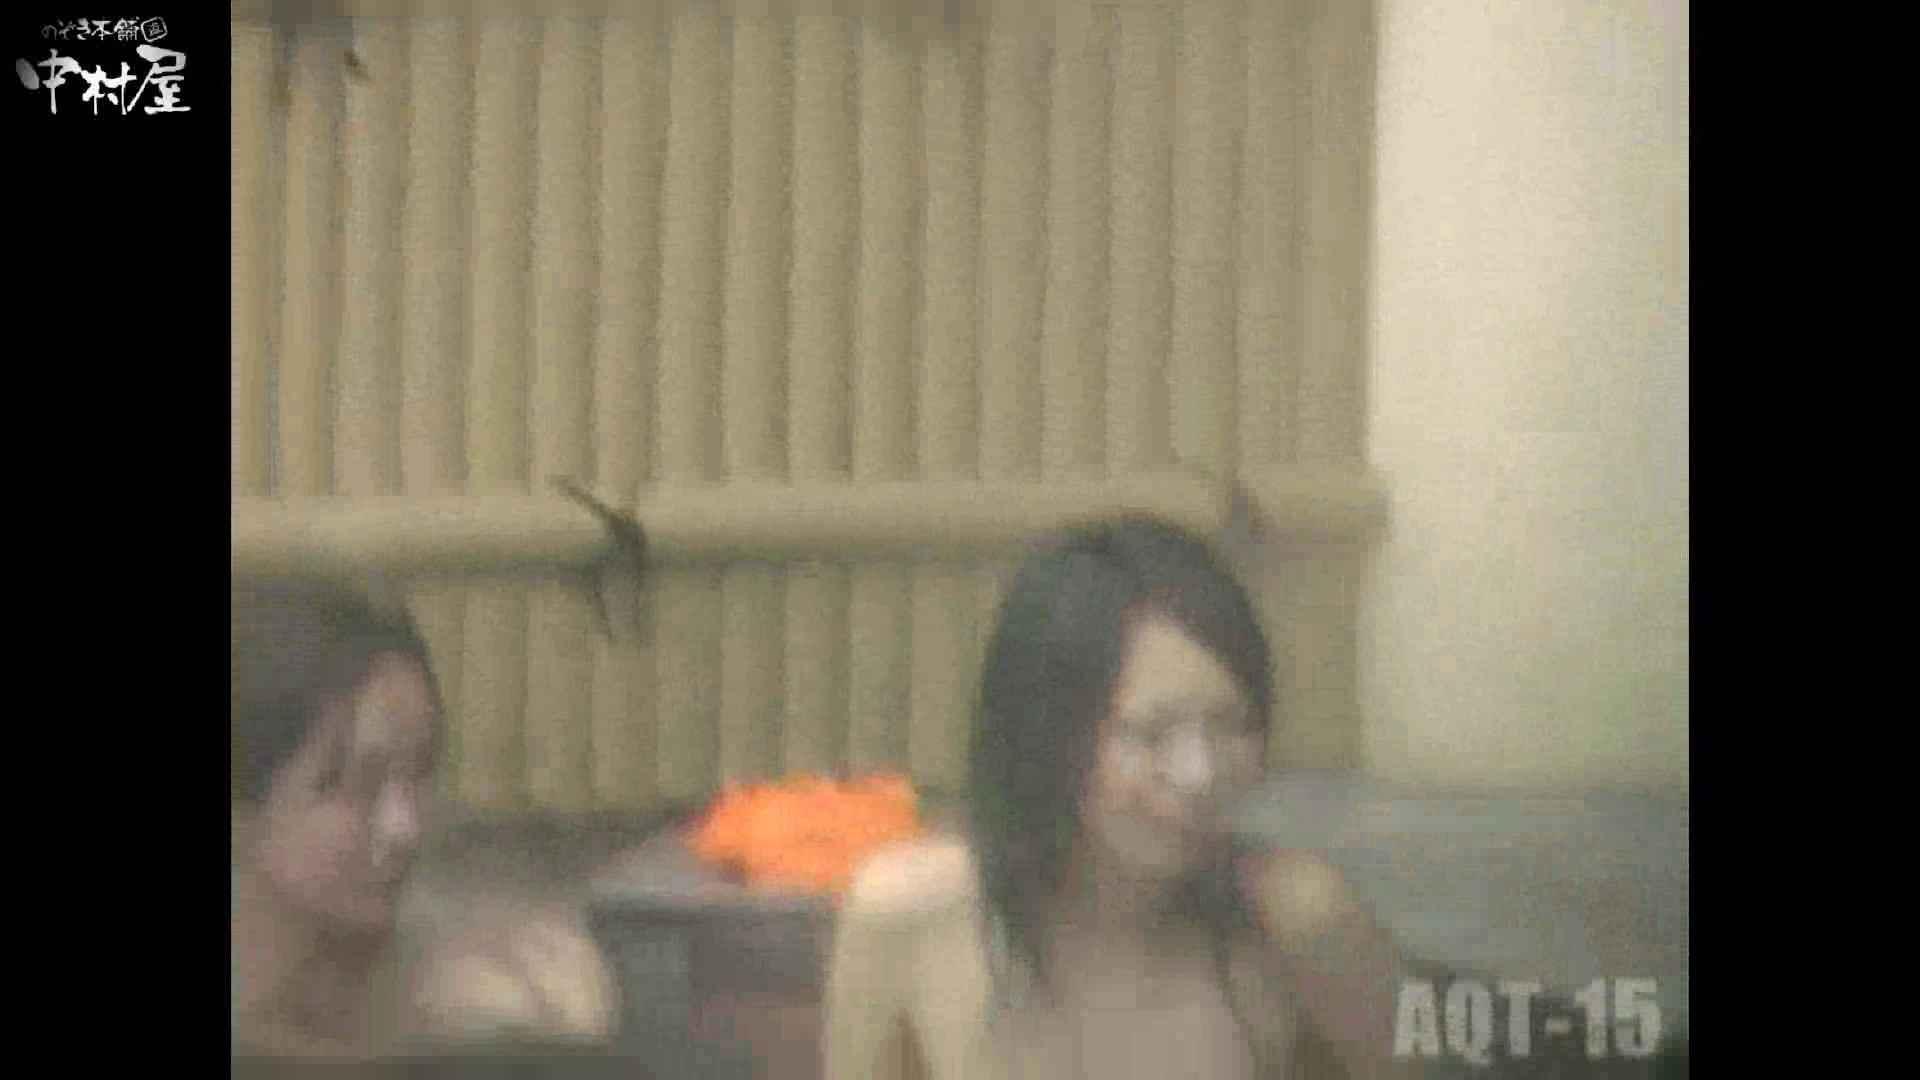 Aquaな露天風呂Vol.878潜入盗撮露天風呂十五判湯 其の八 盗撮 | HなOL  81pic 29